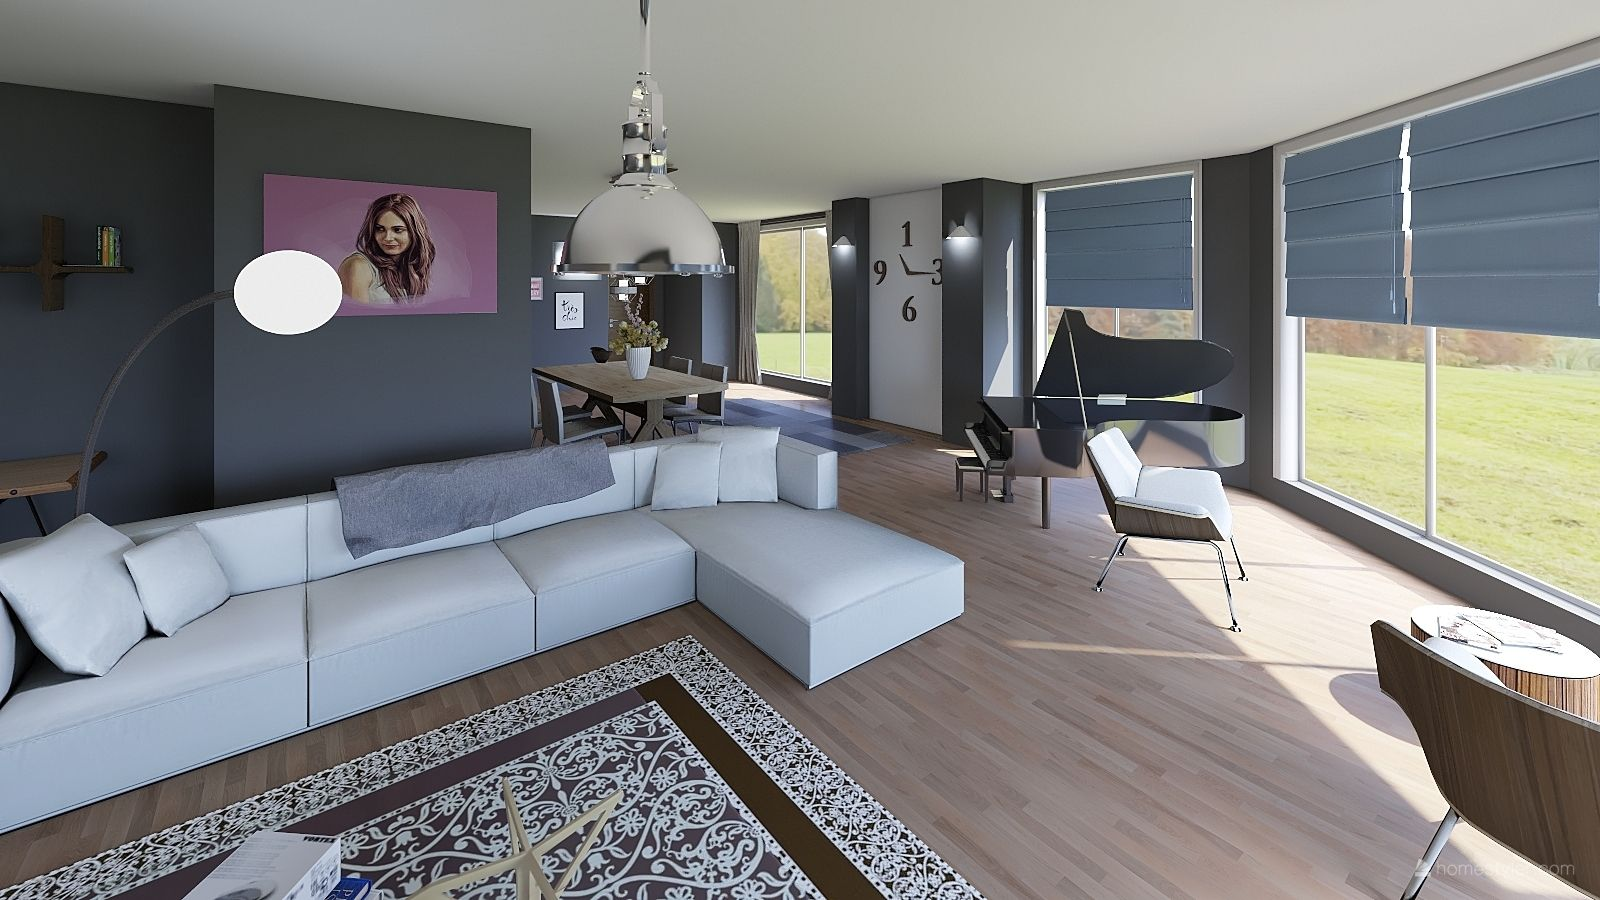 Living Room Decor By Chumafox Interiordesign Livingroom 3d Home Design Software Home Design Software Interior Design Tools